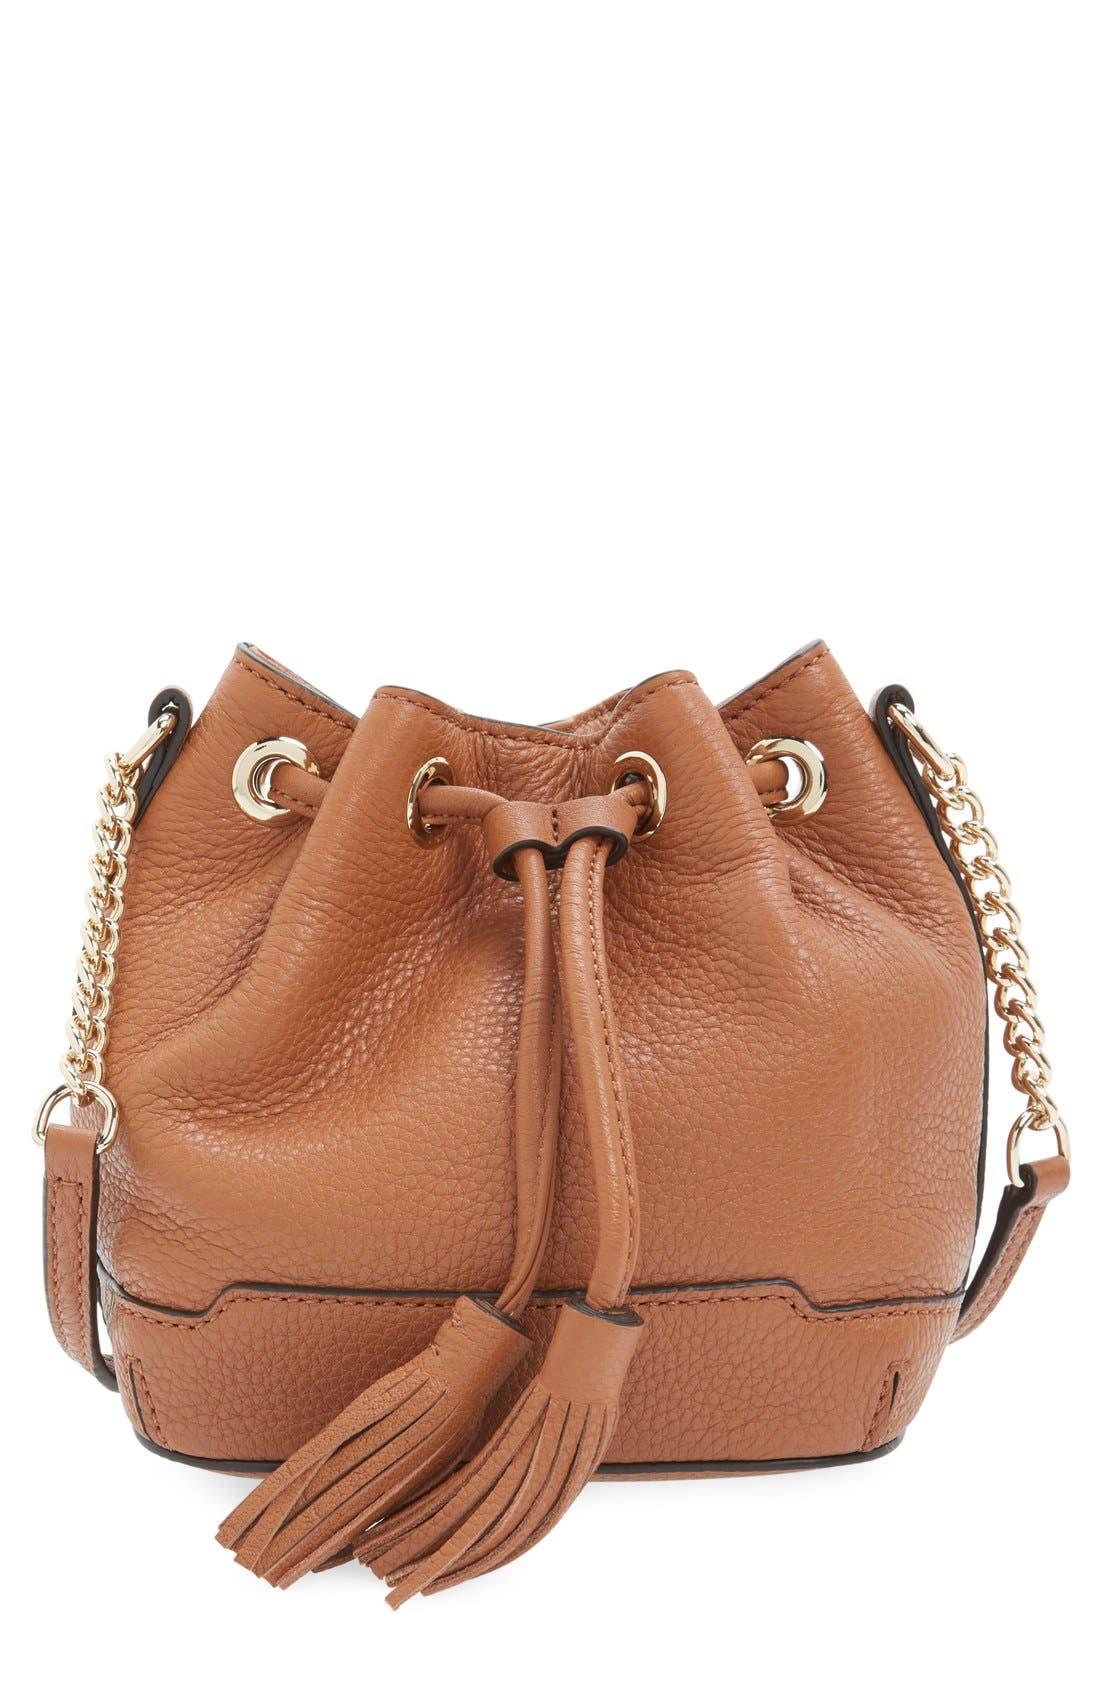 Alternate Image 1 Selected - Rebecca Minkoff 'Micro Lexi' Bucket Bag